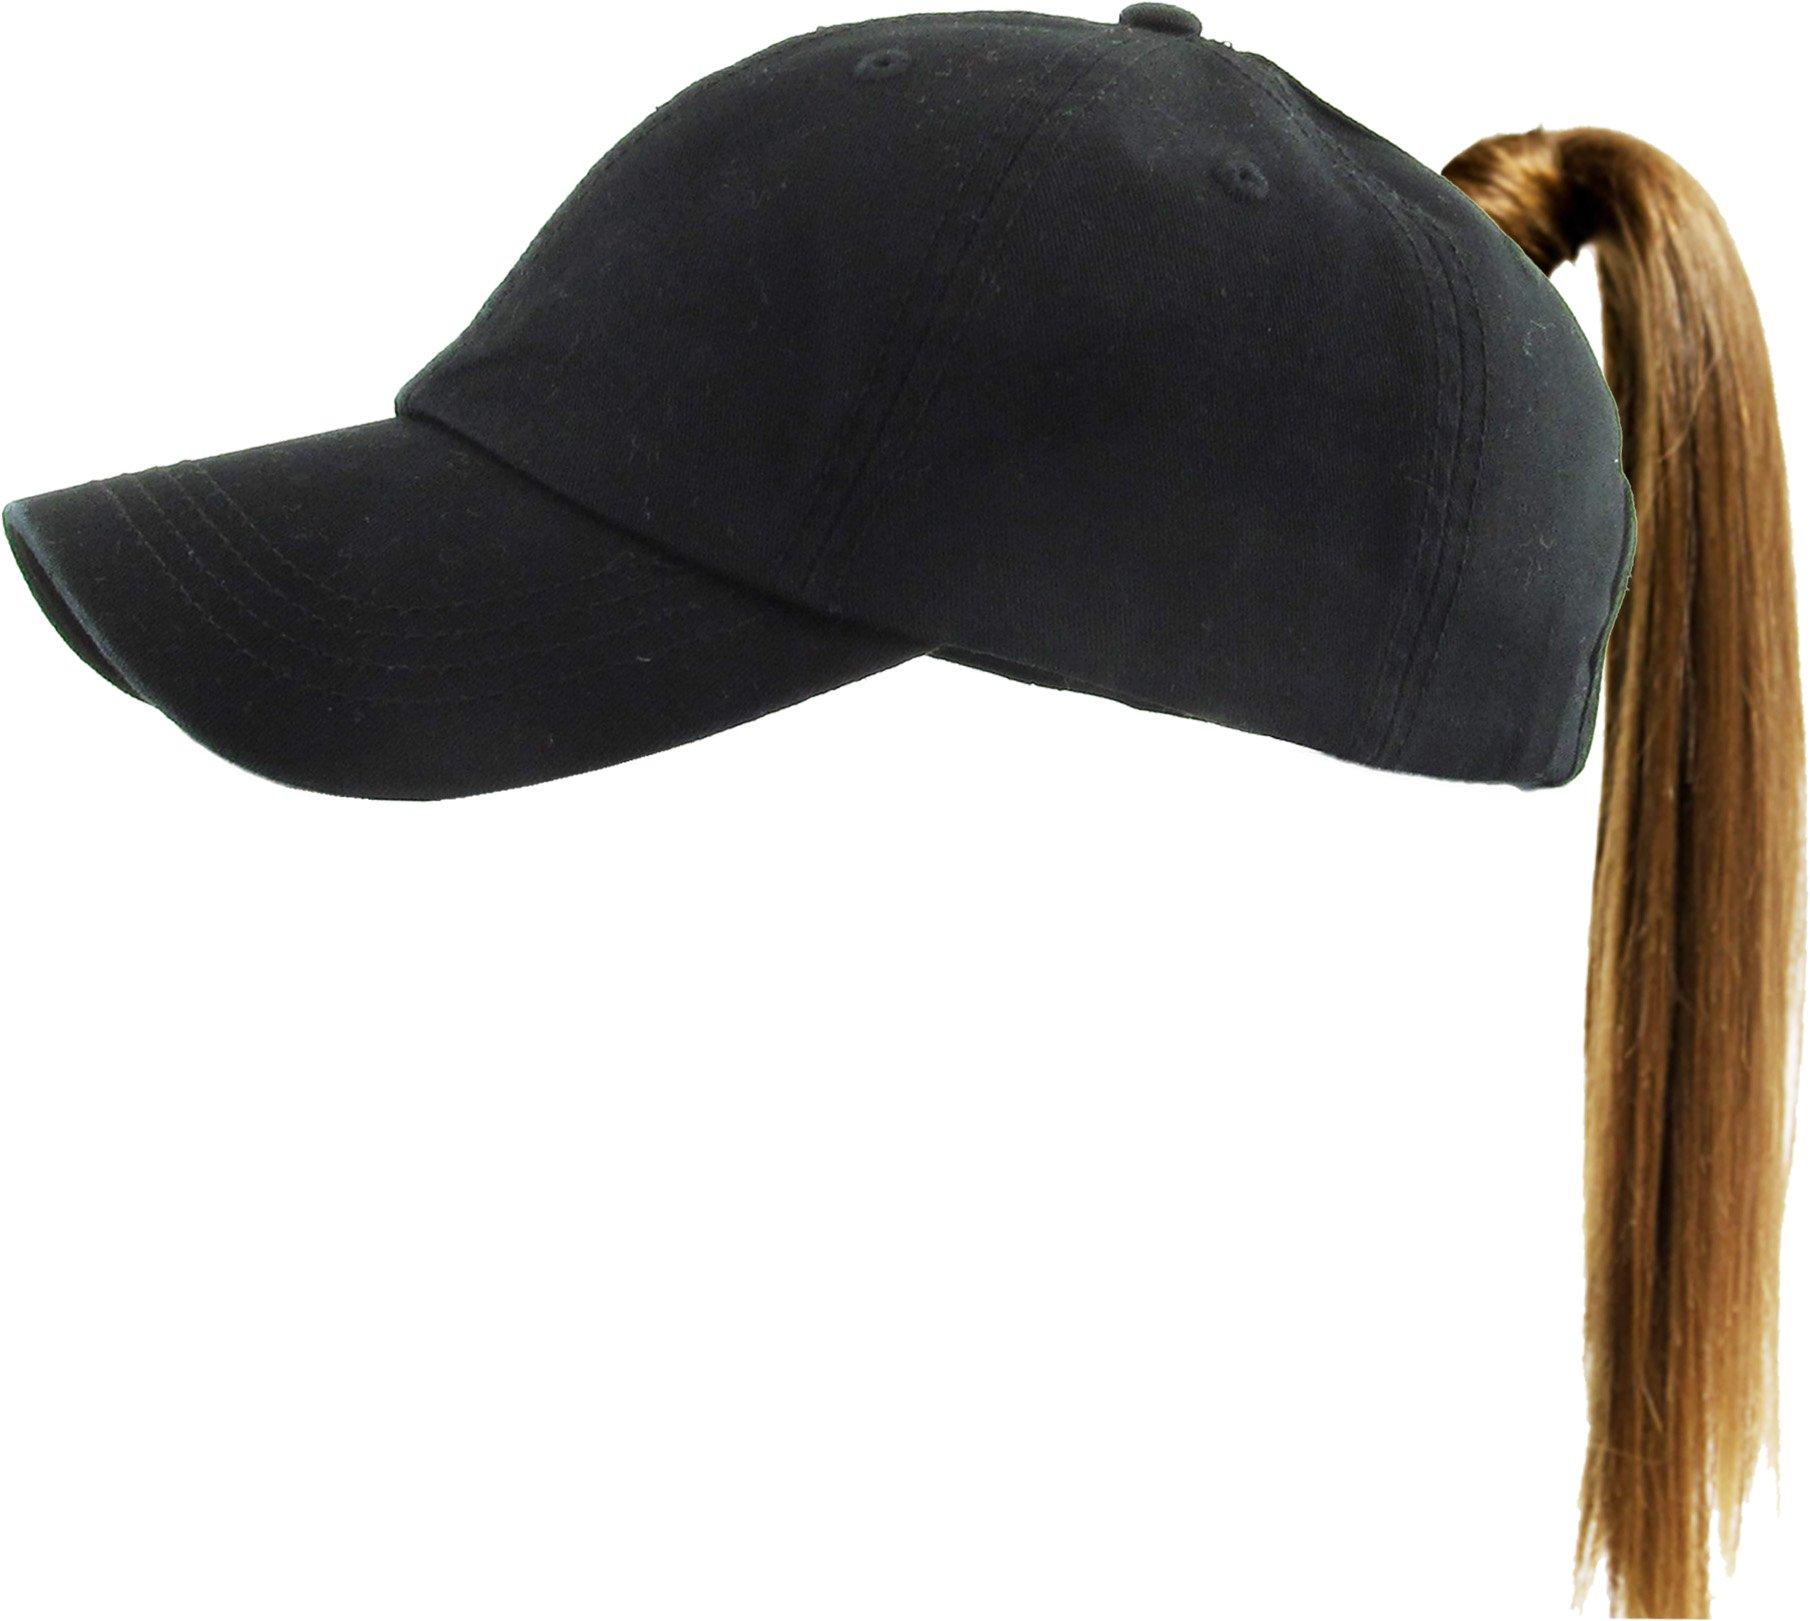 1cf470c9a3265 Bad Hair Day Ponytail All Cotton Baseball Cap Comfy Sports Hat Daily Wear  Messy High Bun